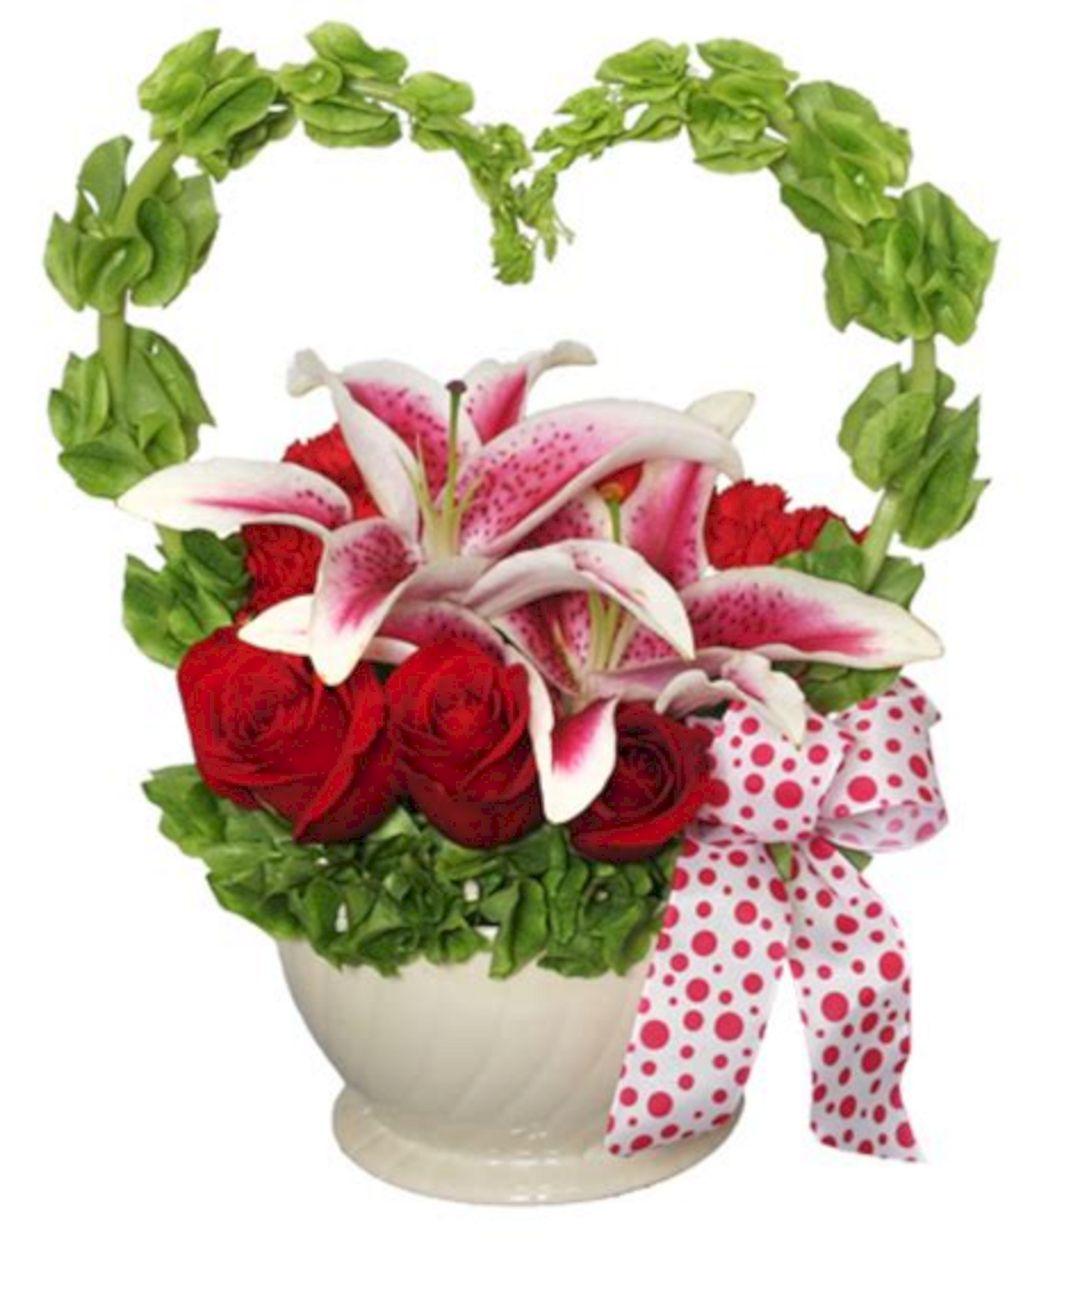 24 Top Valentine Flower Arrangements For Romantic Valentine Ideas